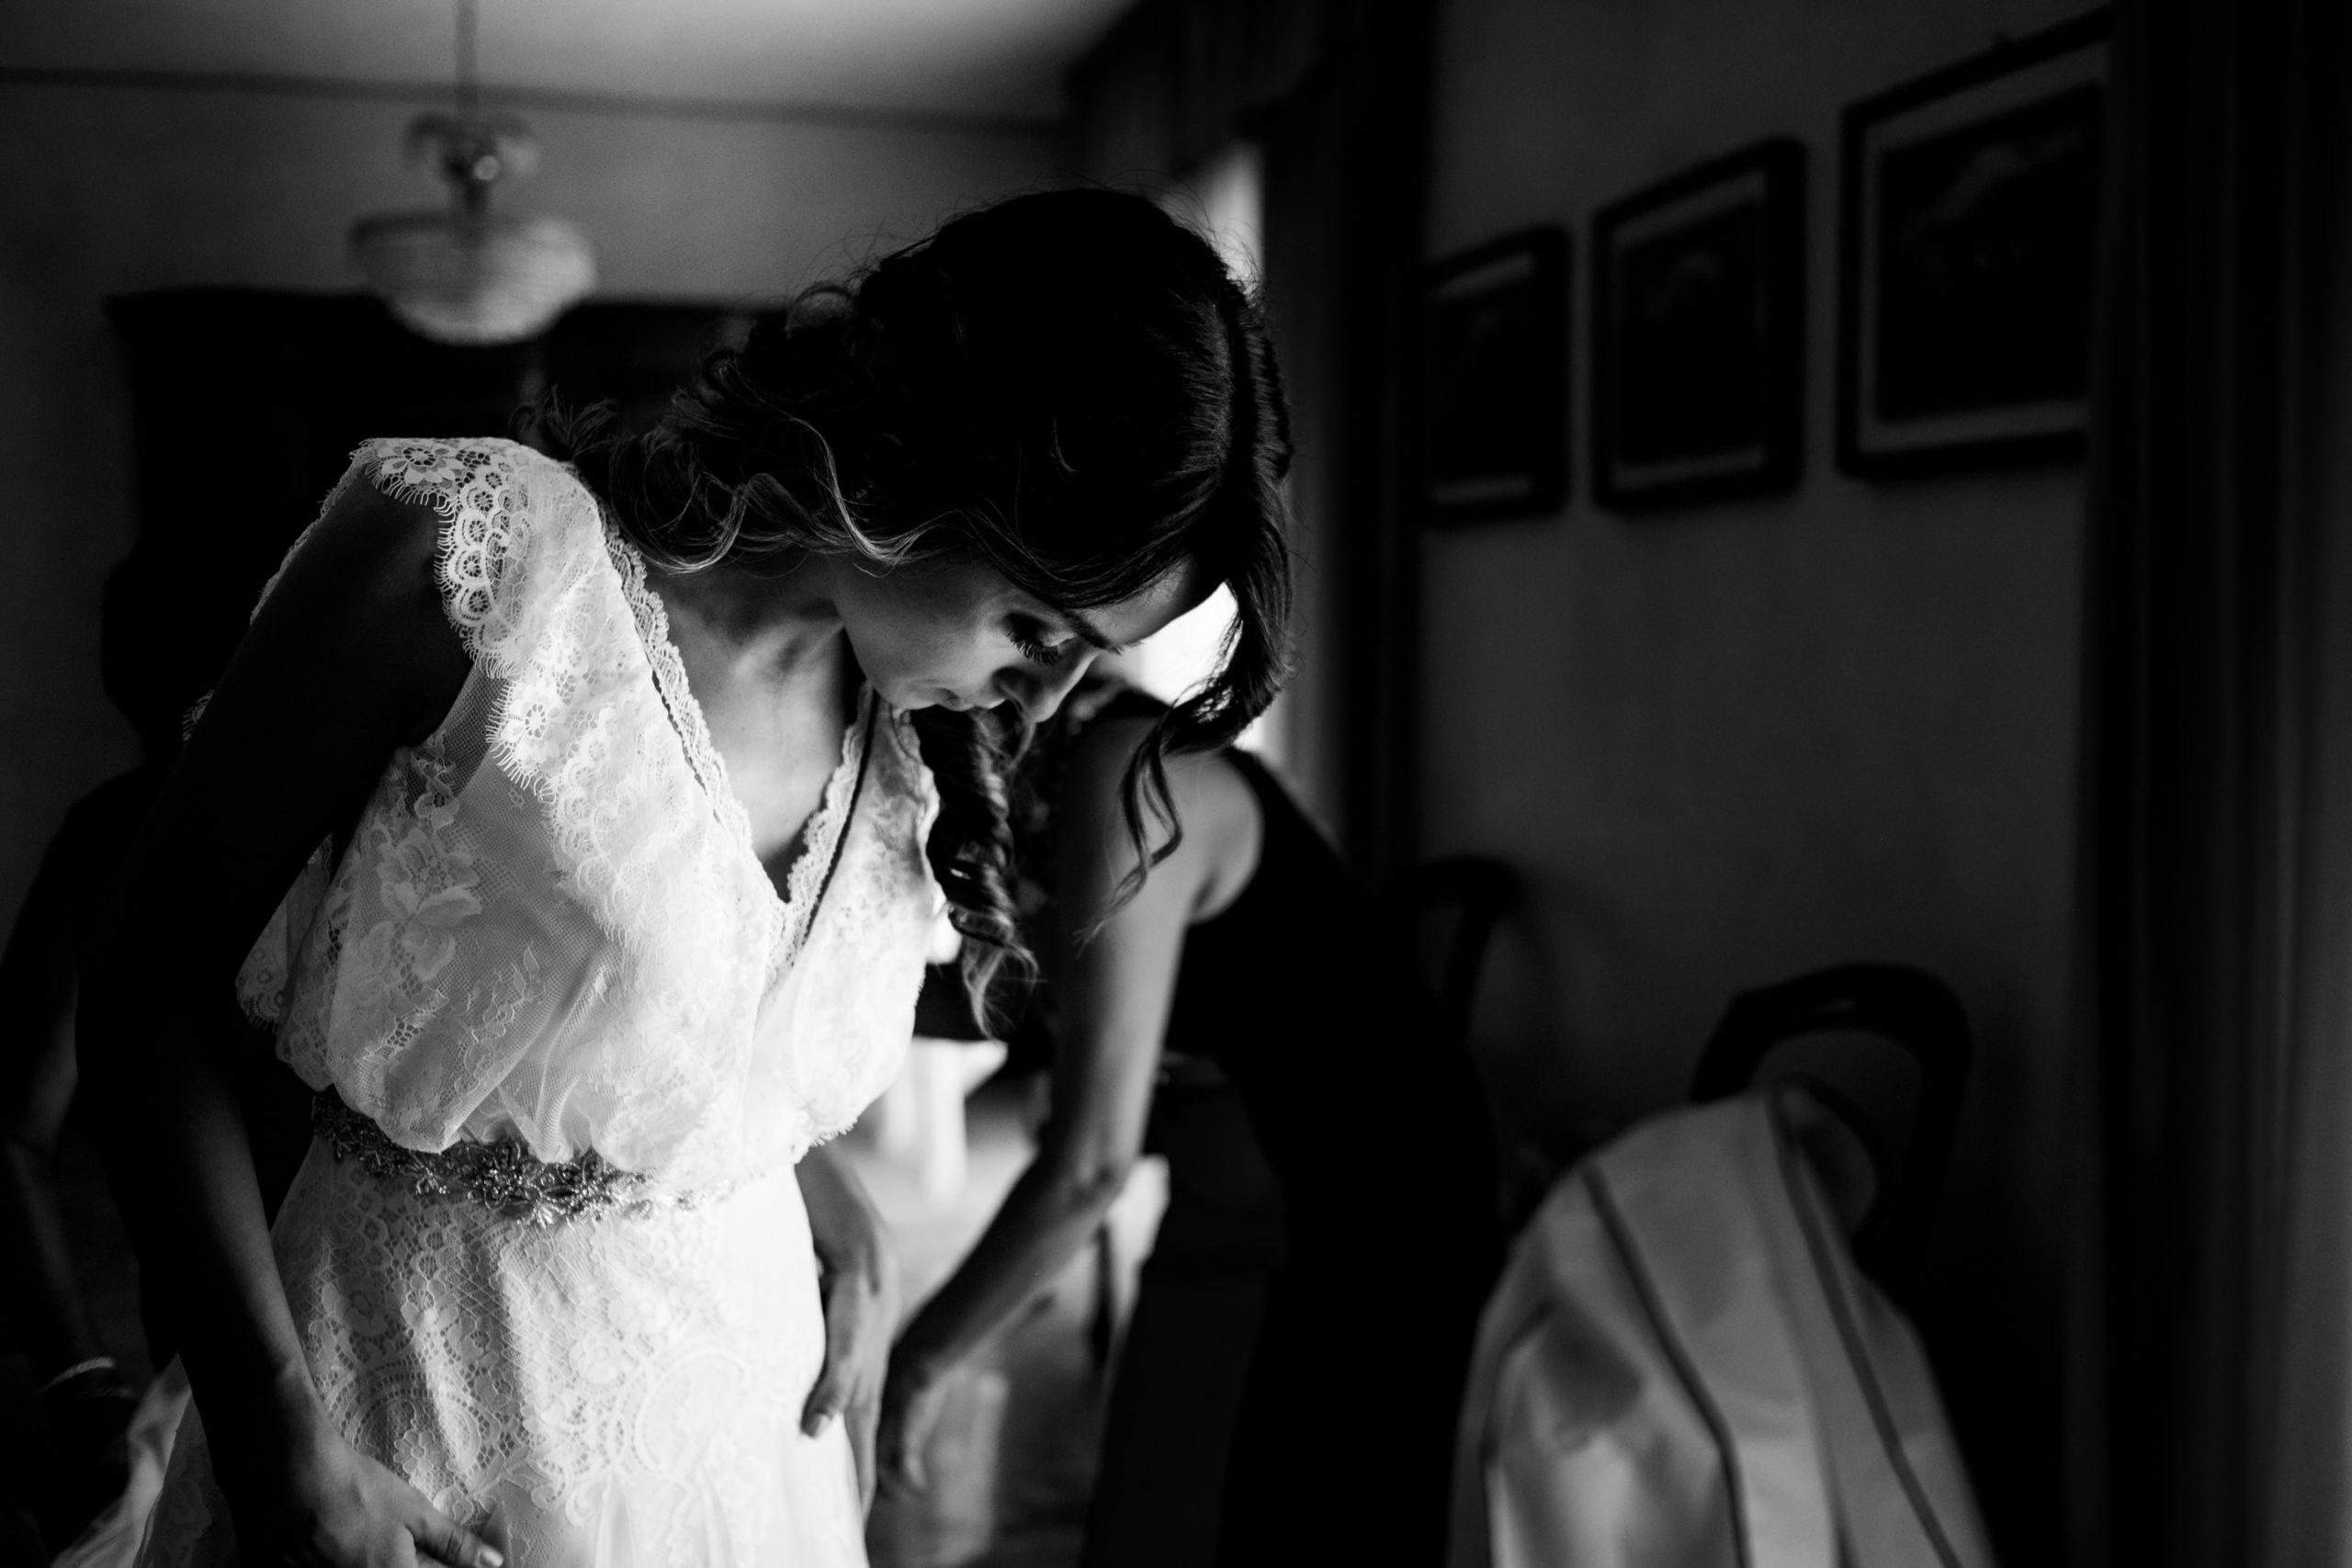 Bride Checking Wedding Dress